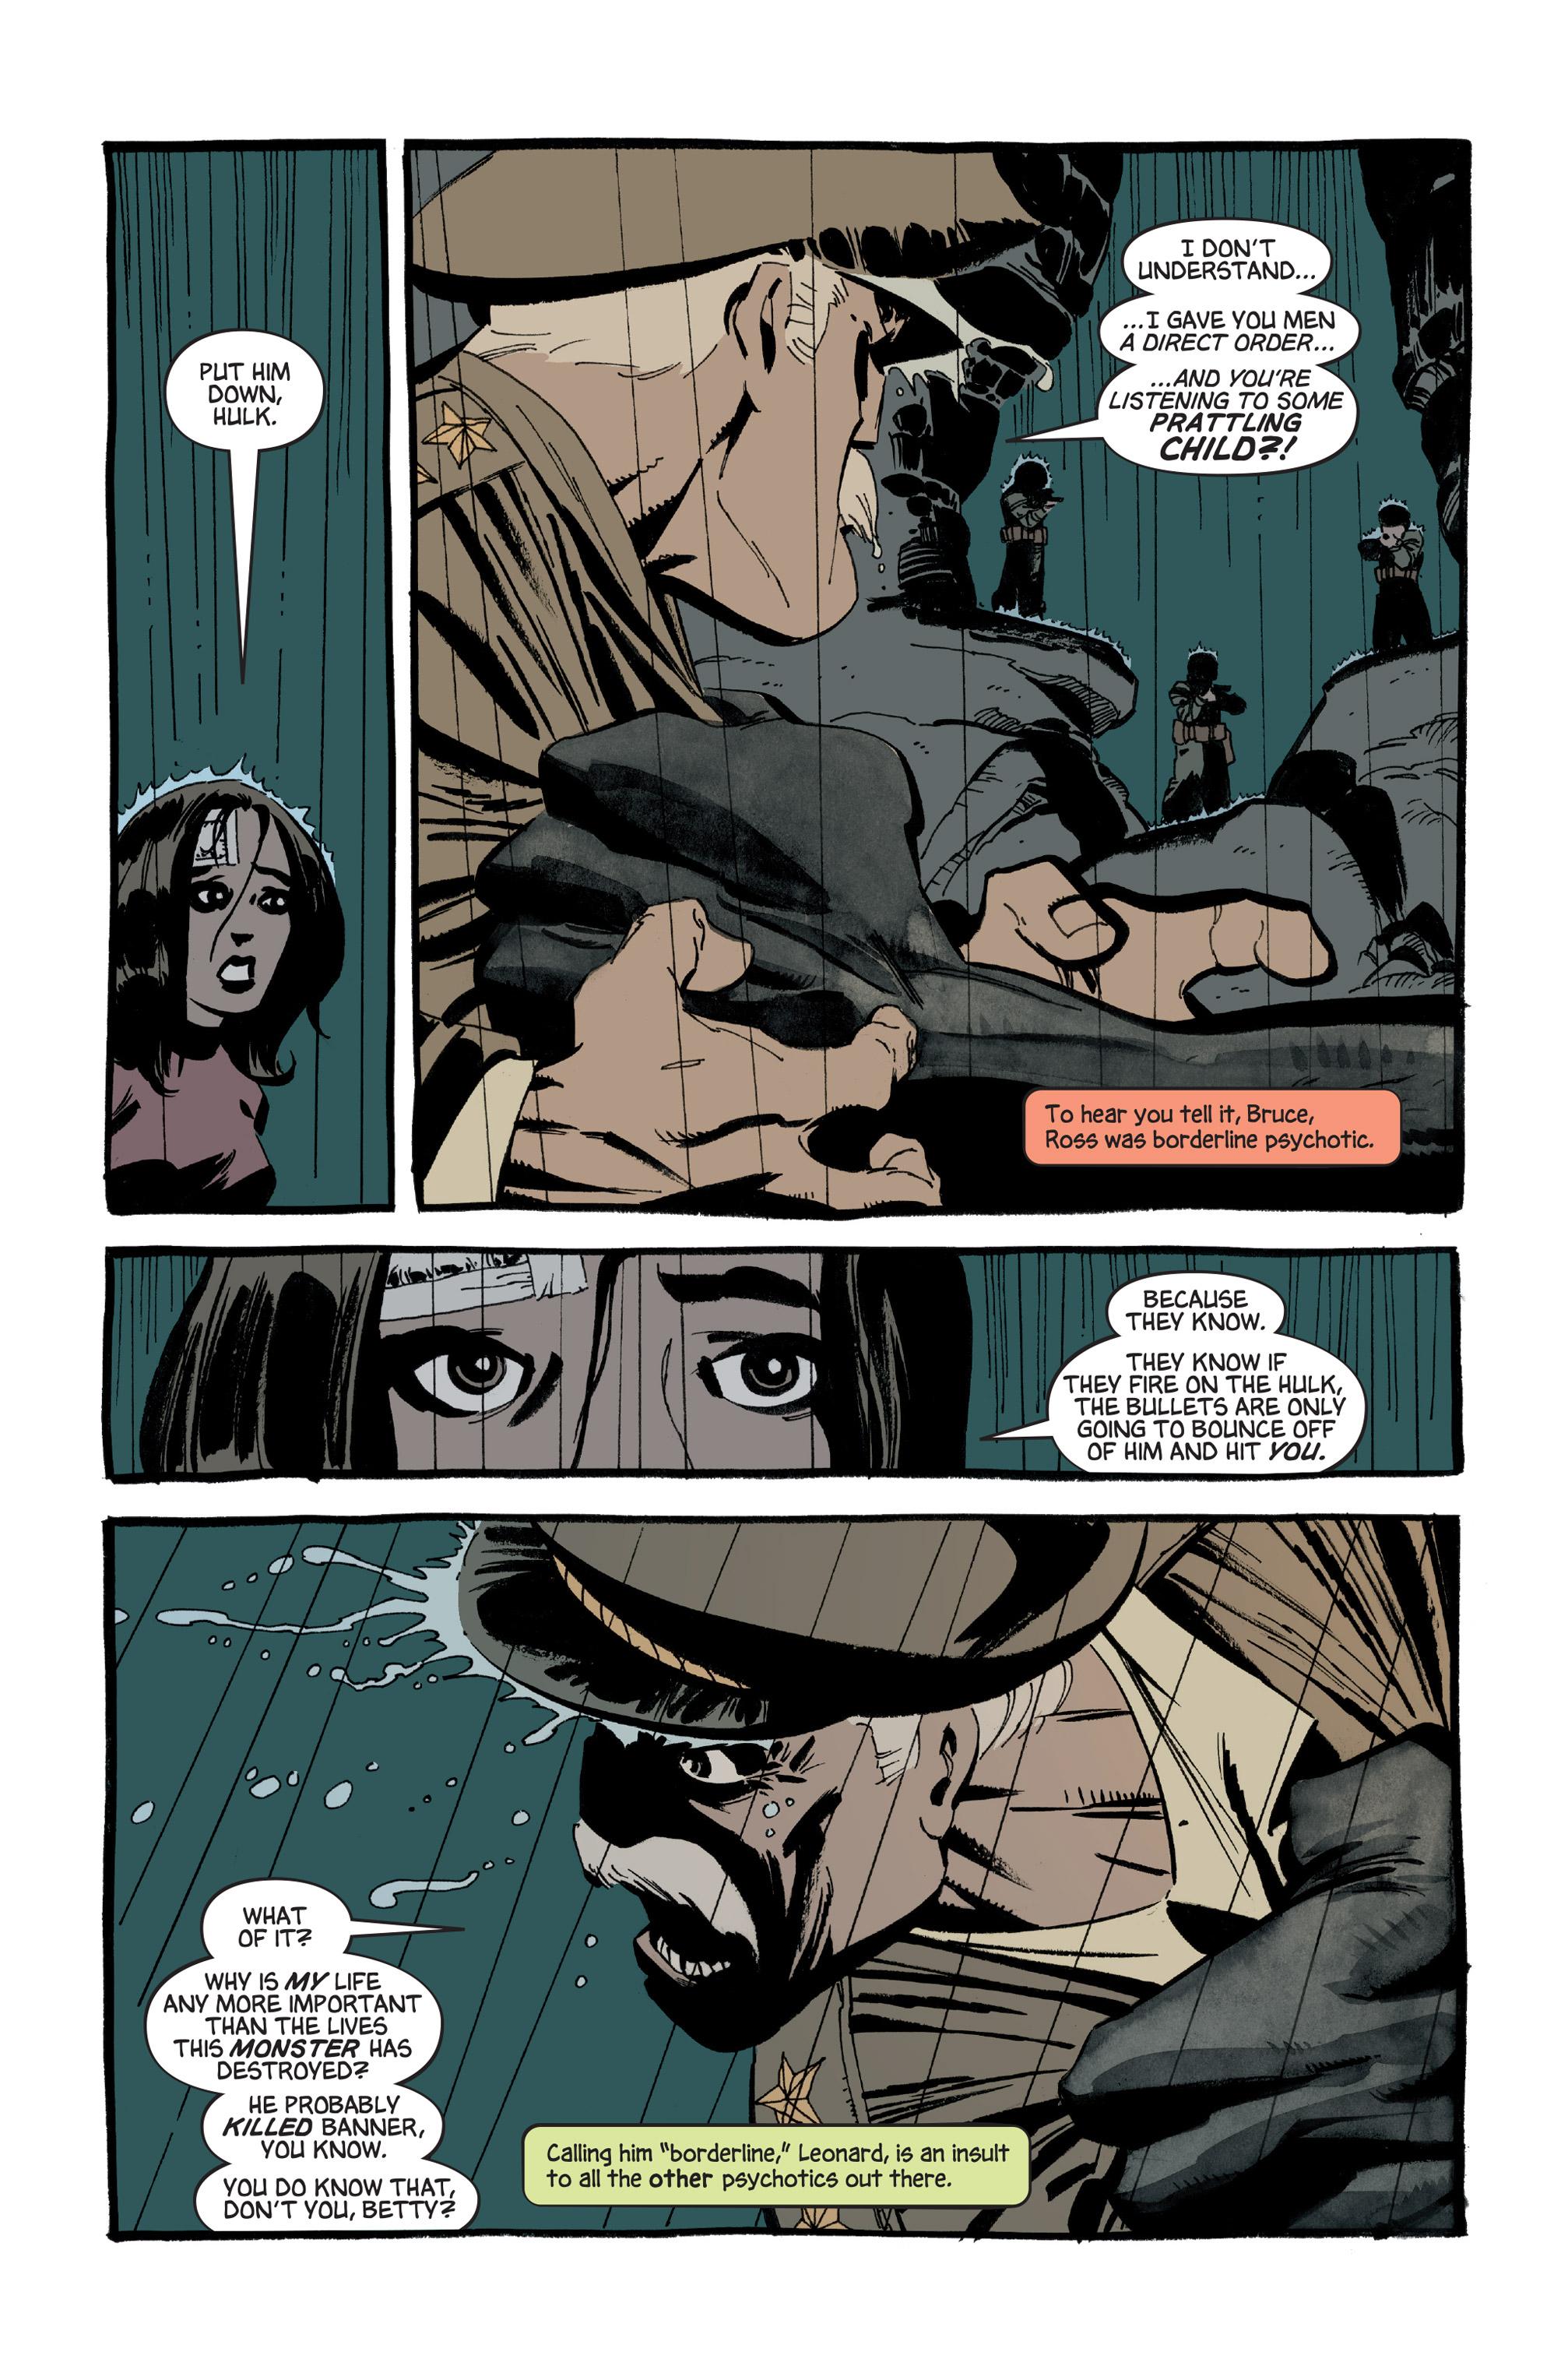 Read online Hulk: Gray comic -  Issue #6 - 13